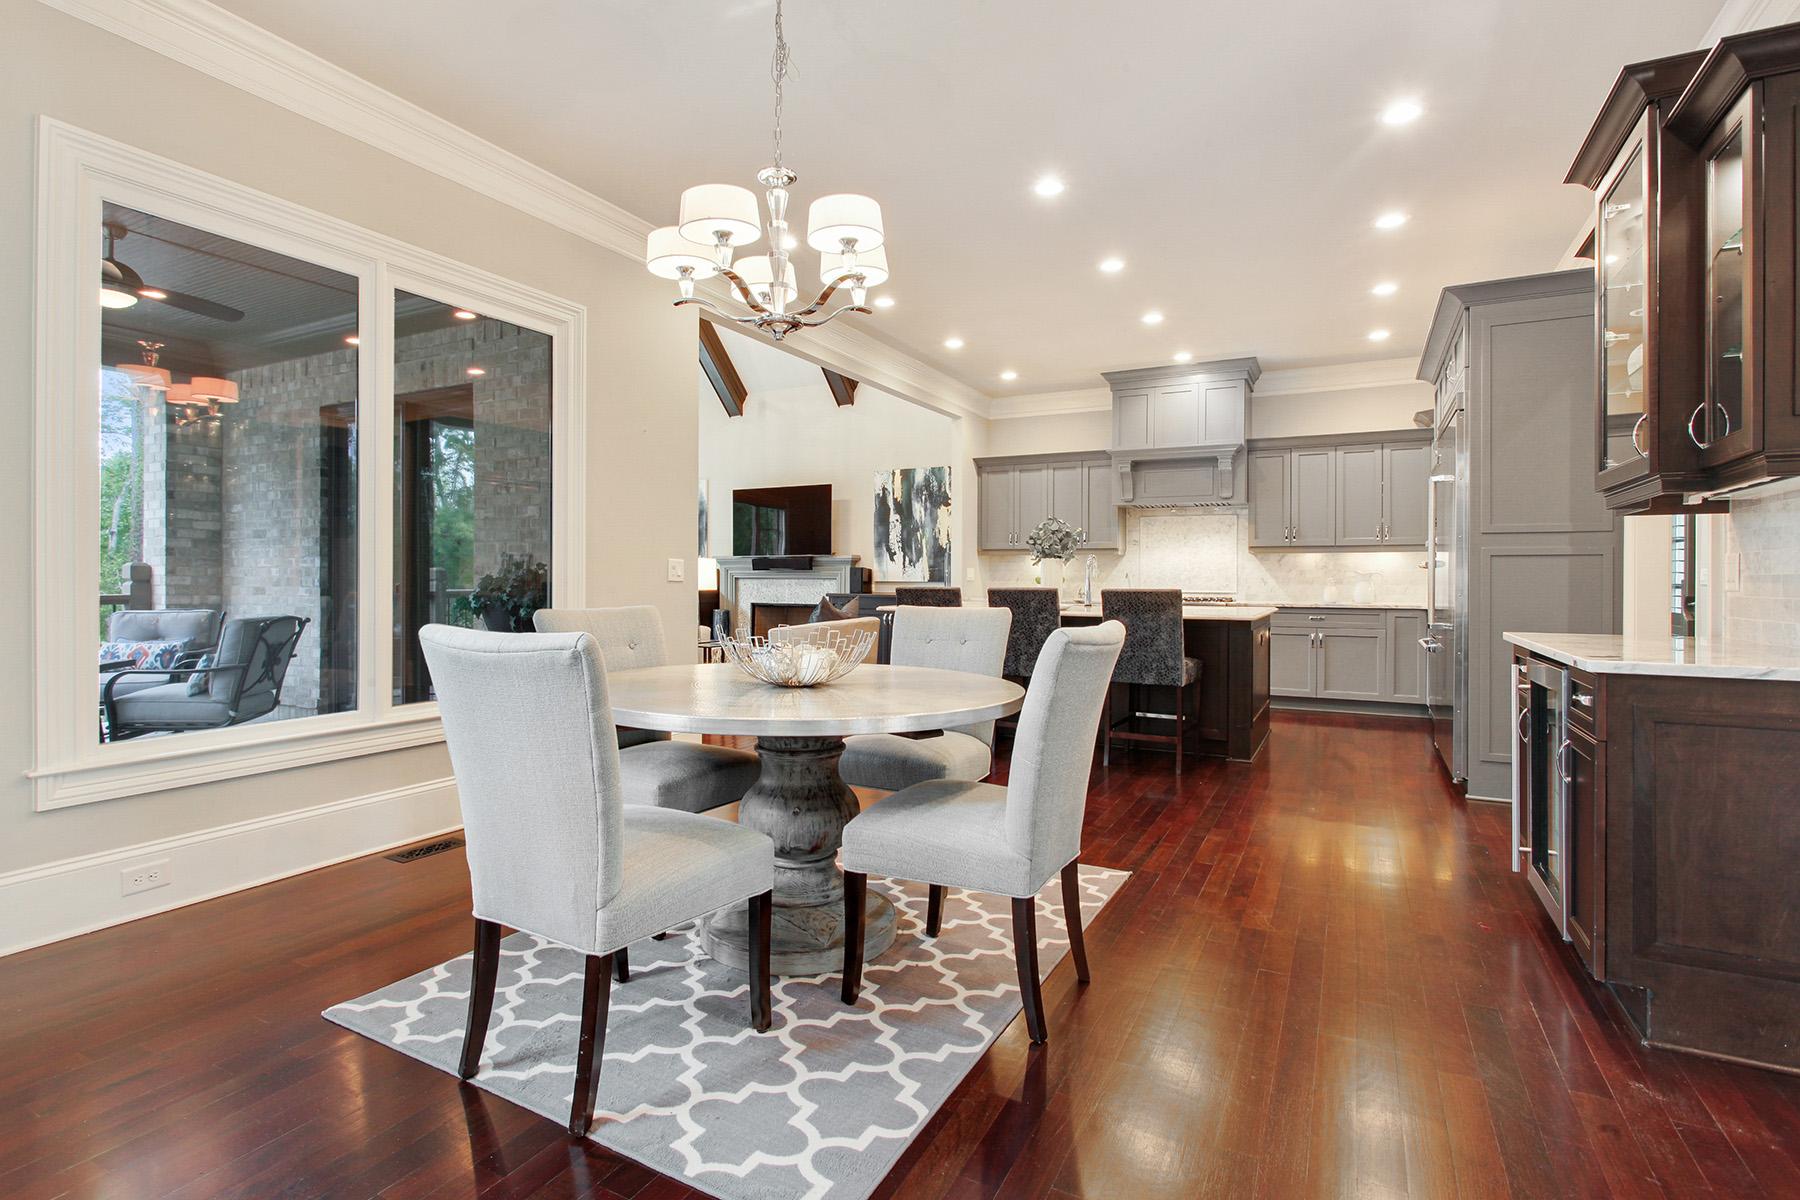 Additional photo for property listing at Elegant Estate In Acworth 4401 Oglethorpe Loop NW, Acworth, Georgia 30101 Stati Uniti